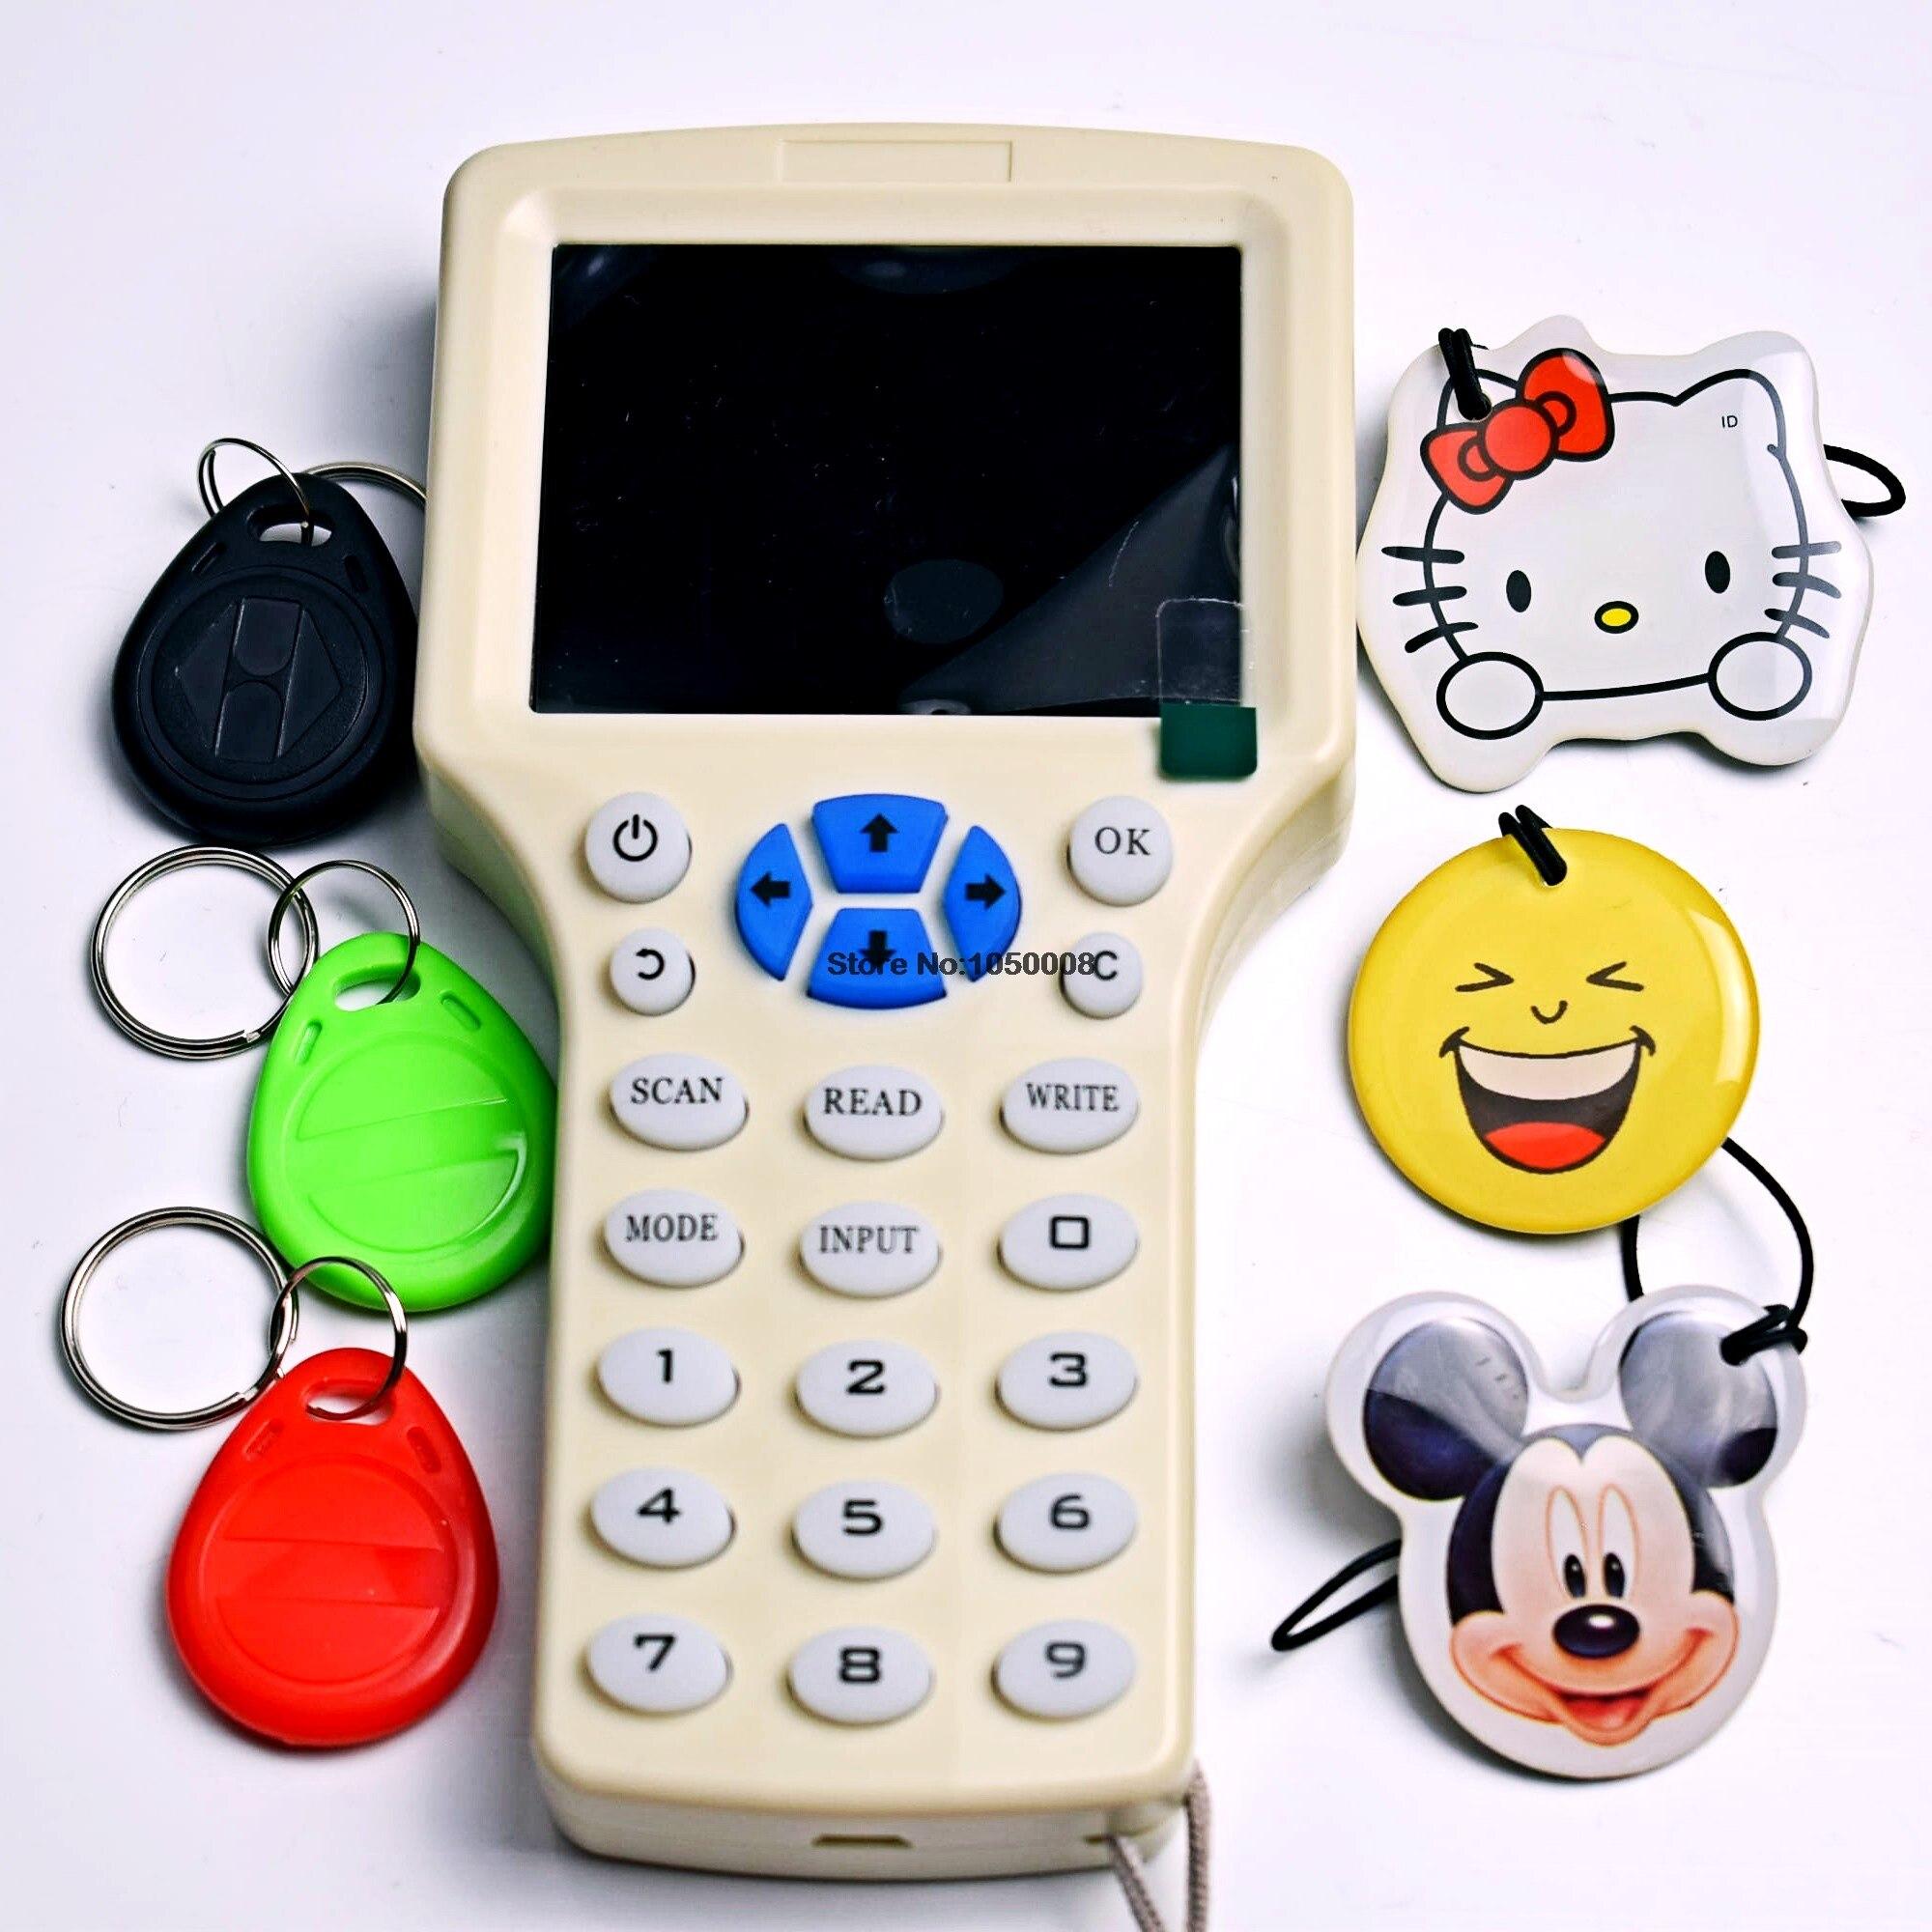 все цены на English Rfid NFC Copier Reader Writer duplicator 10 Frequency Programmer +3pcs 125khz T5577 Writable Epoxy Tag + 3pcs T5577 Key онлайн